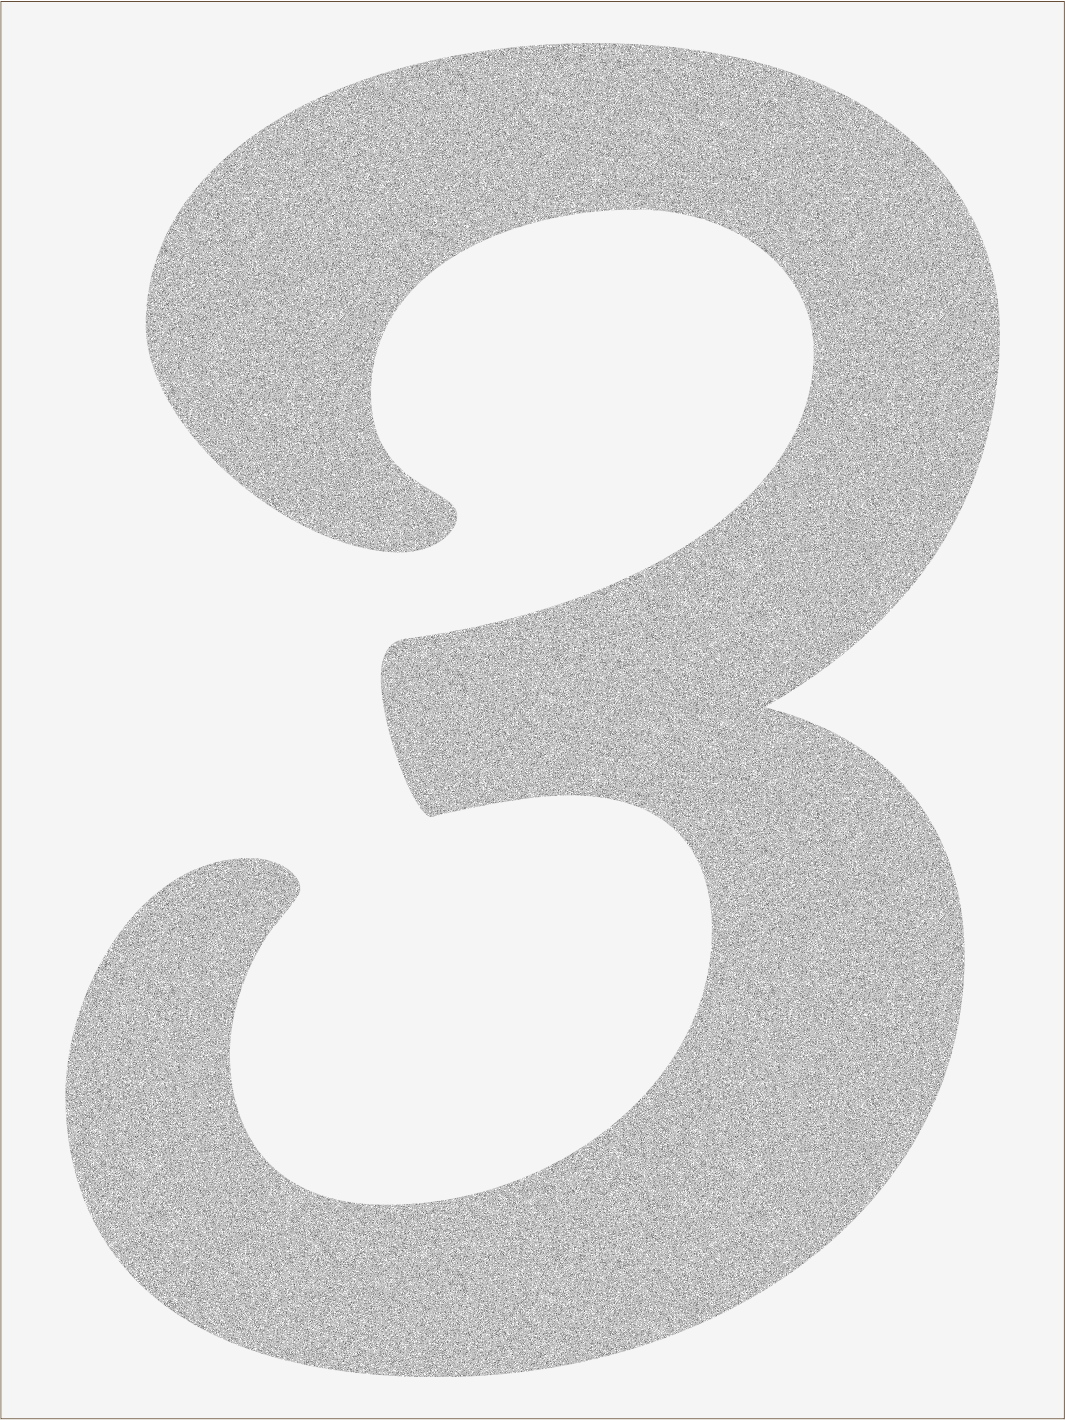 Číslica 3 font1